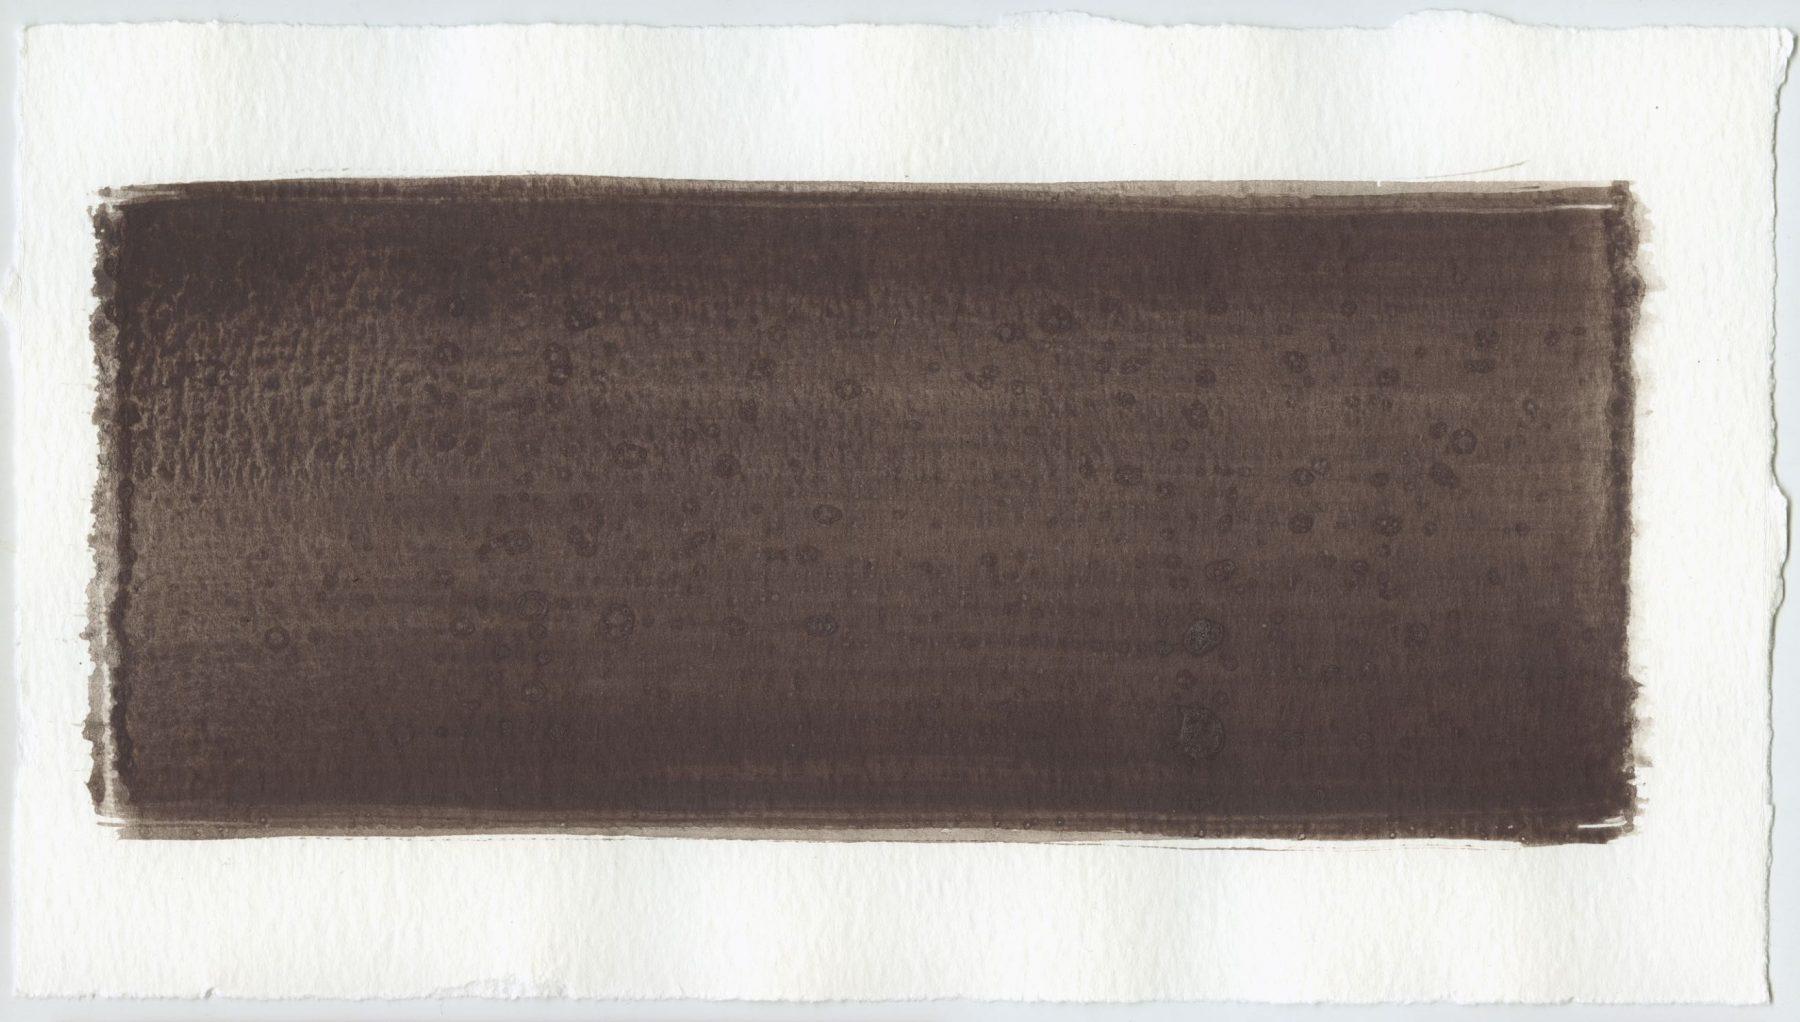 No. 16 MORTEL PAARSGRIJS FIJN - clay and iron oxide [burnt no. 3, 1260°C] - fine grind 18 September 2018 51° 42.213'N   5° 34.678'E